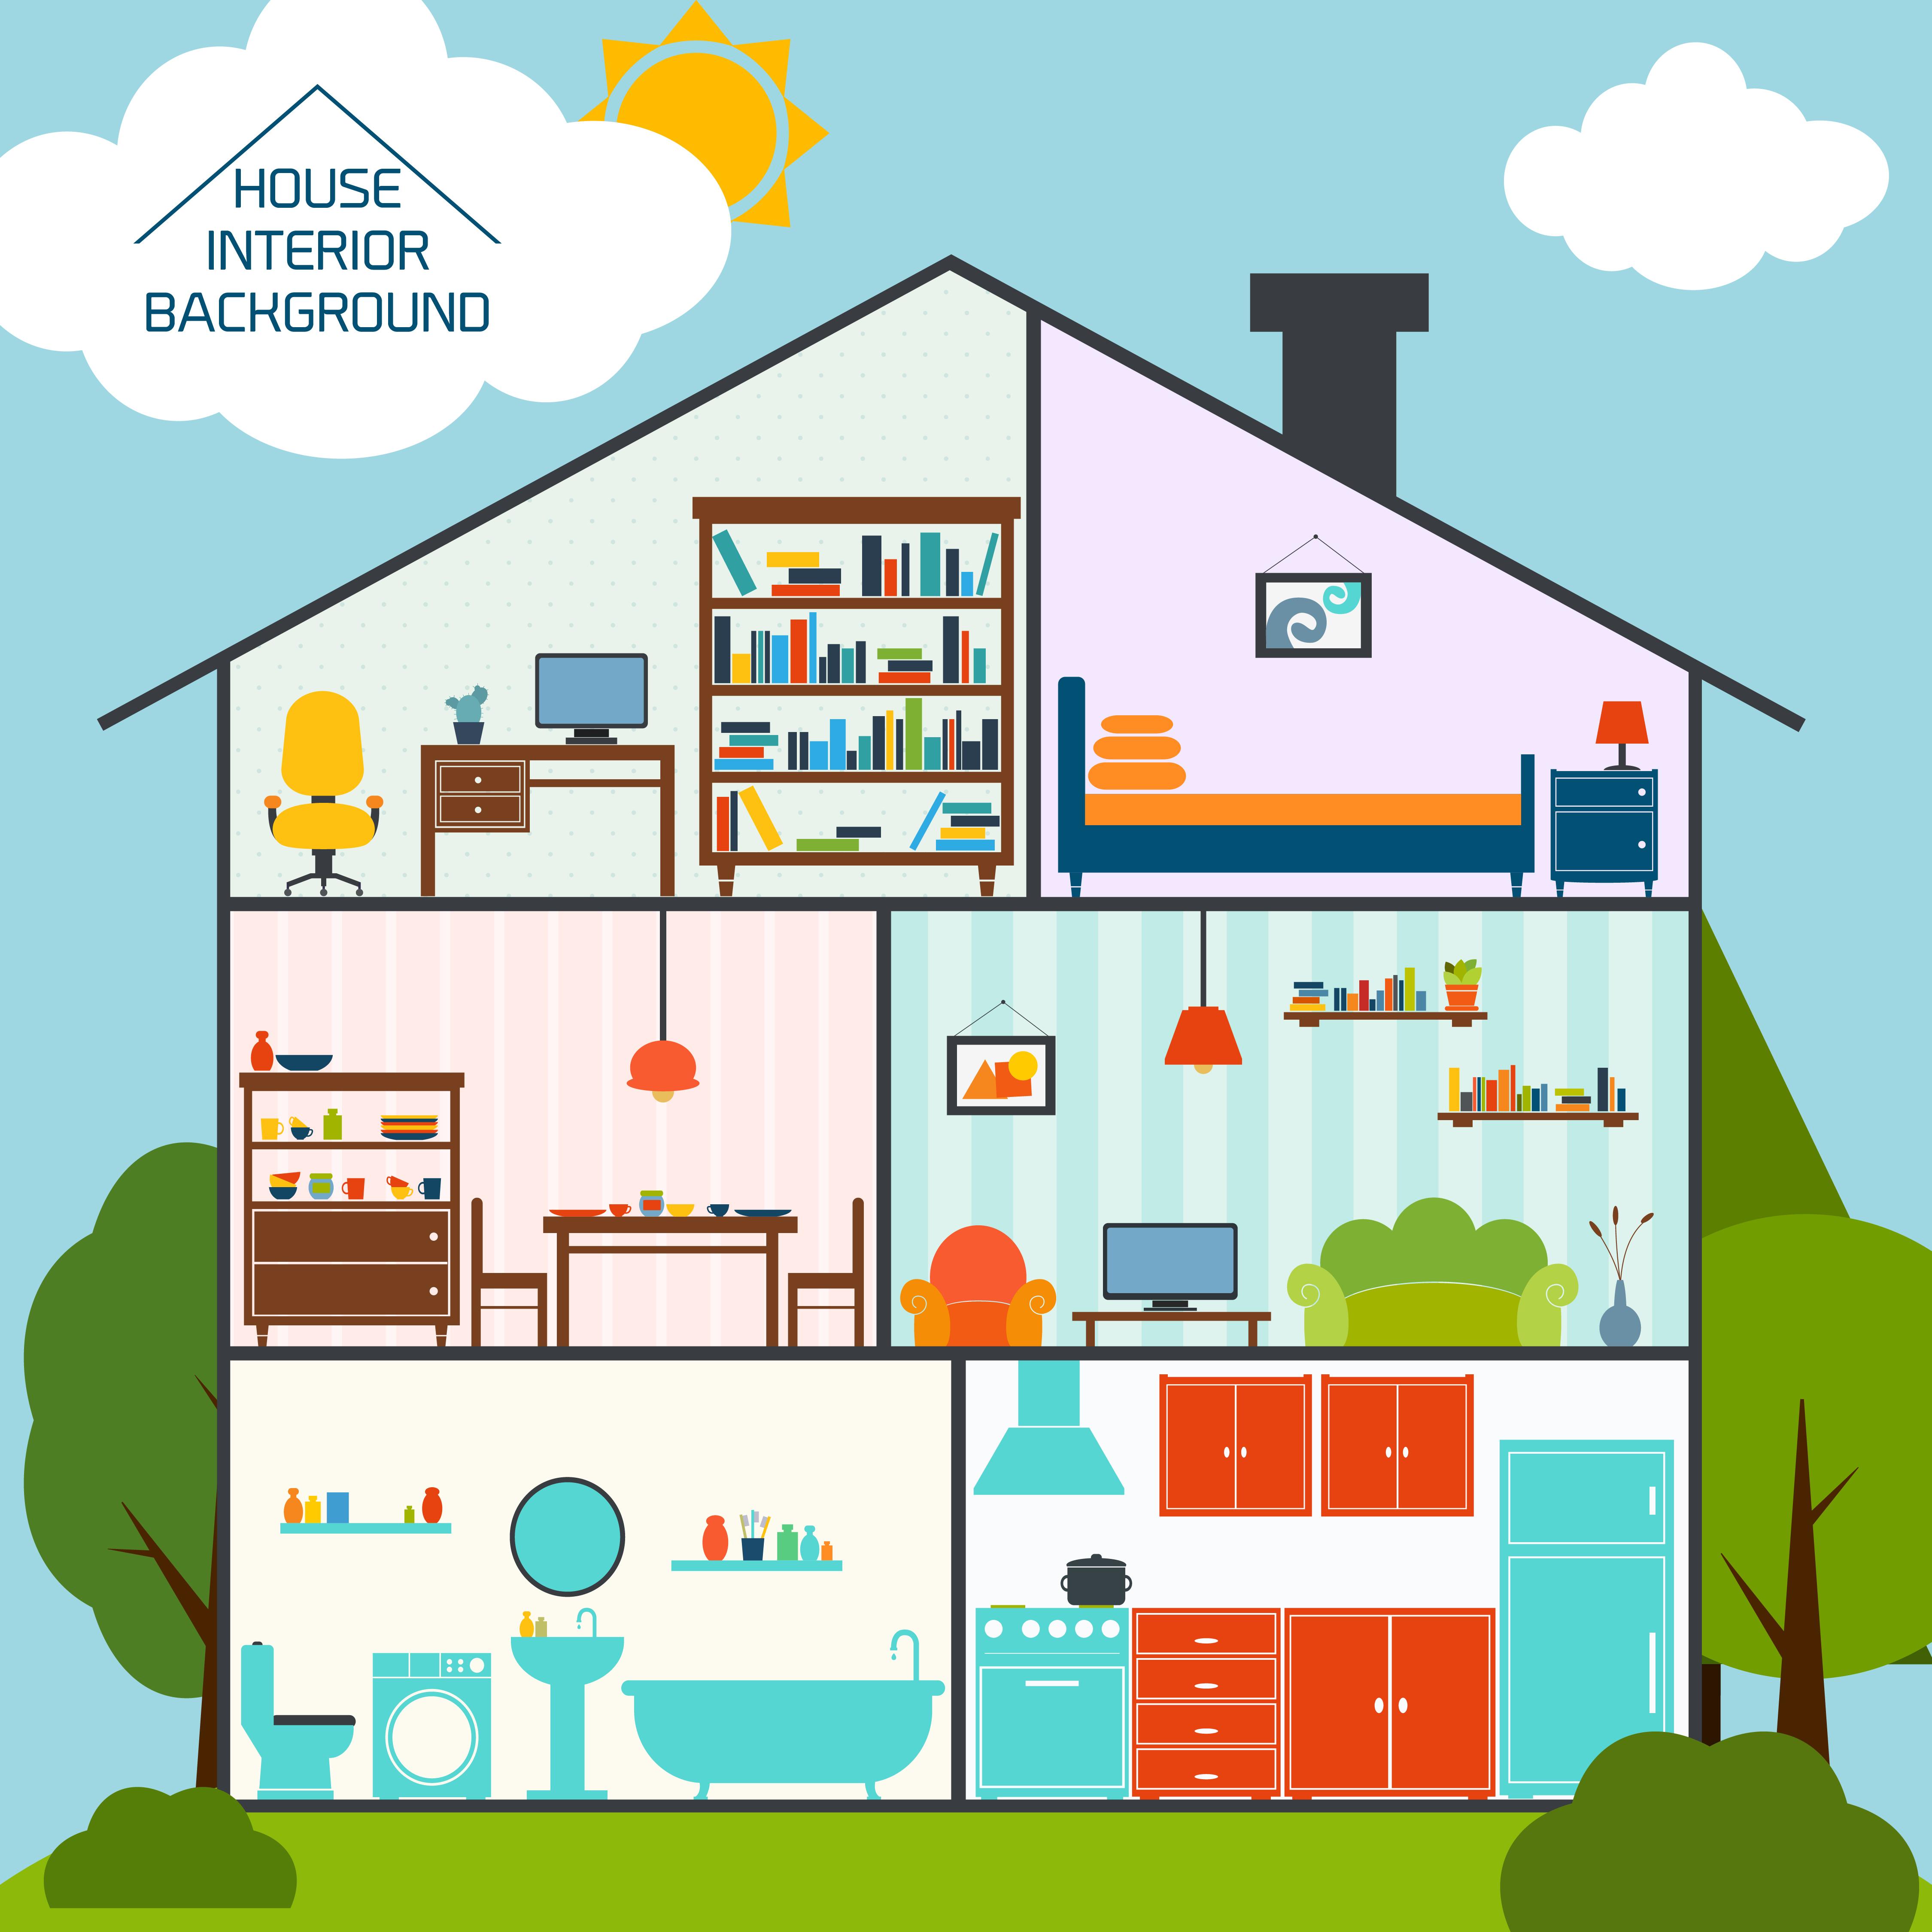 House Interior Background Download Free Vectors Clipart Graphics Vector Art